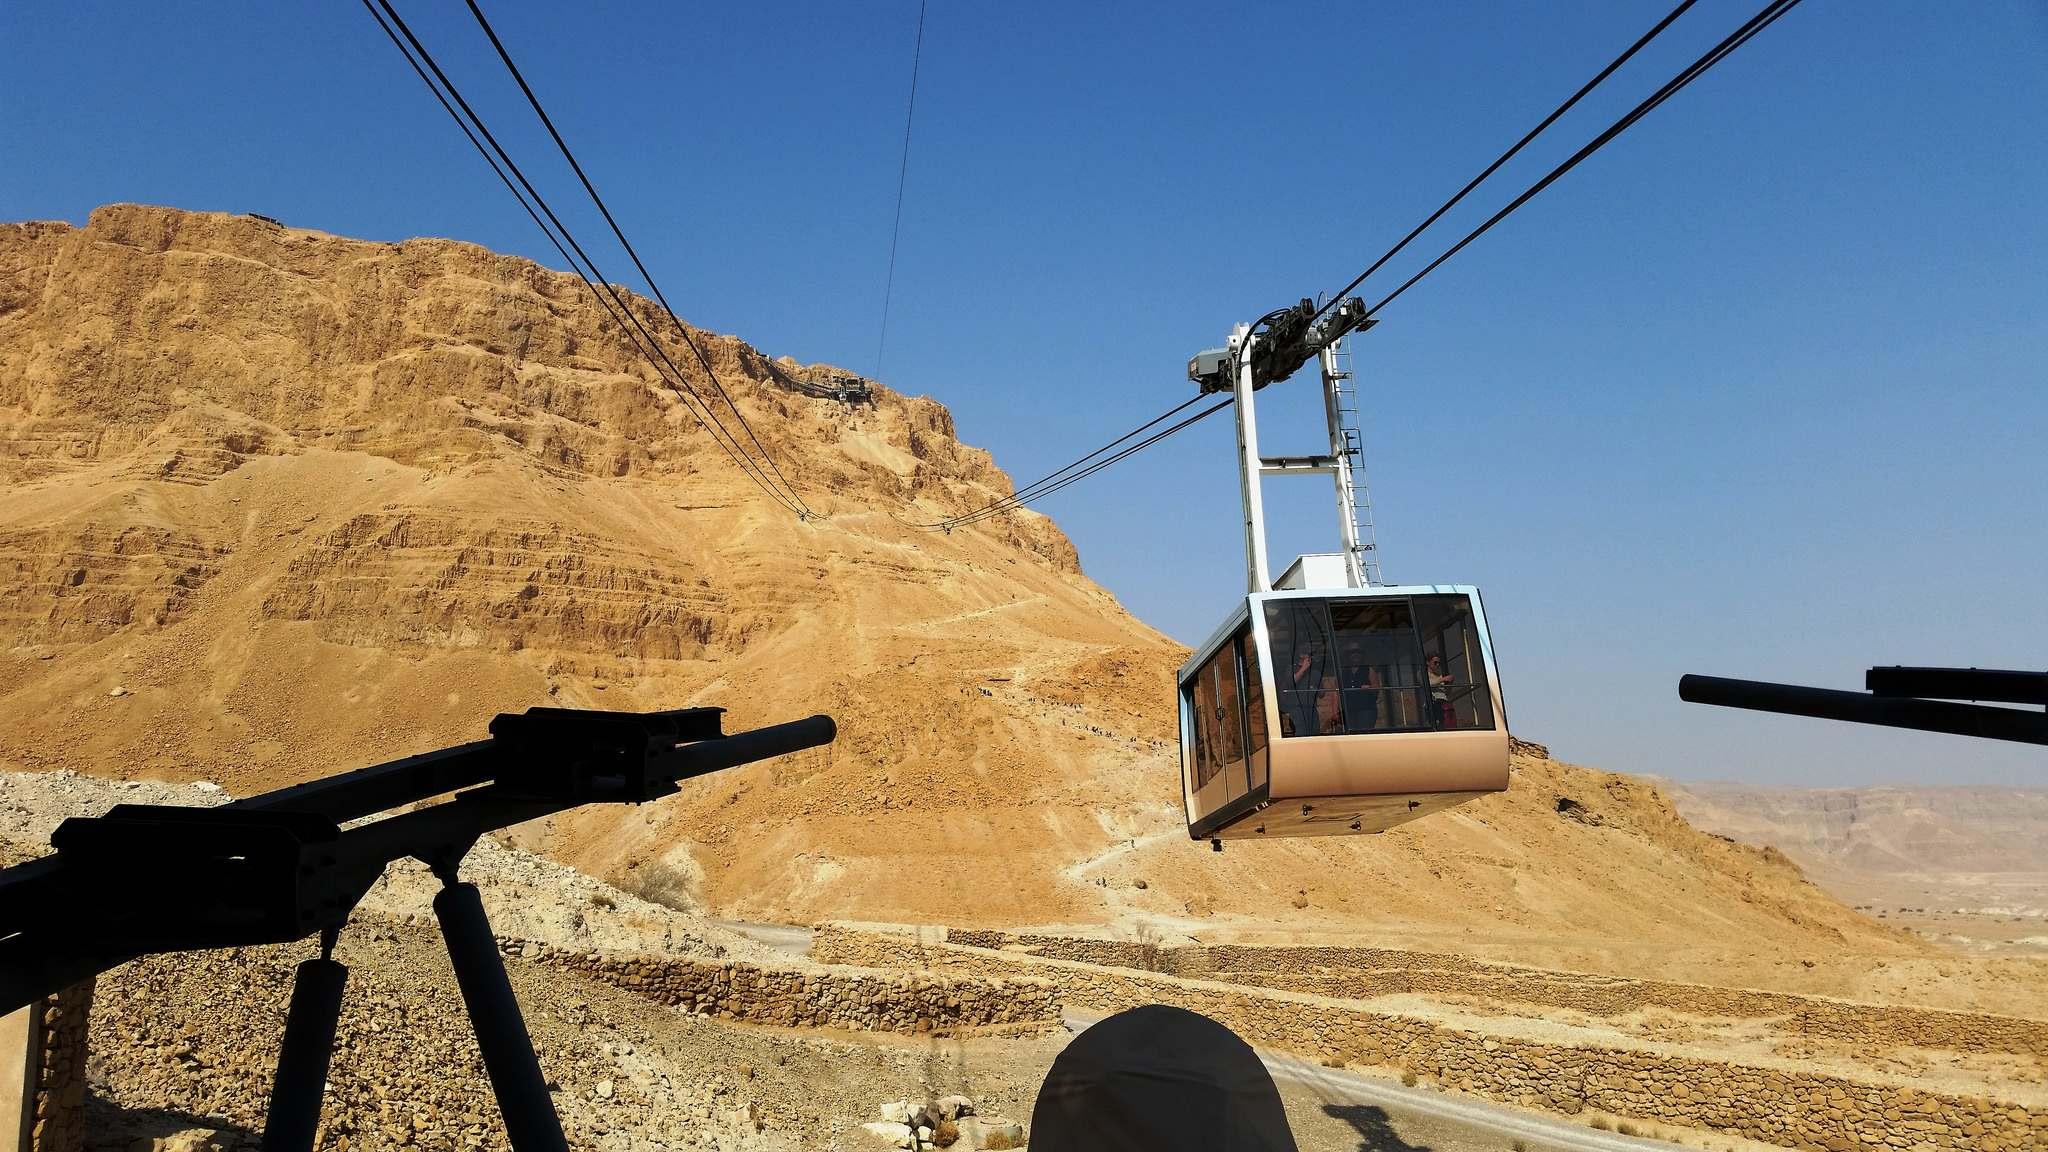 masada2 Masada Desert Fortress in Israel